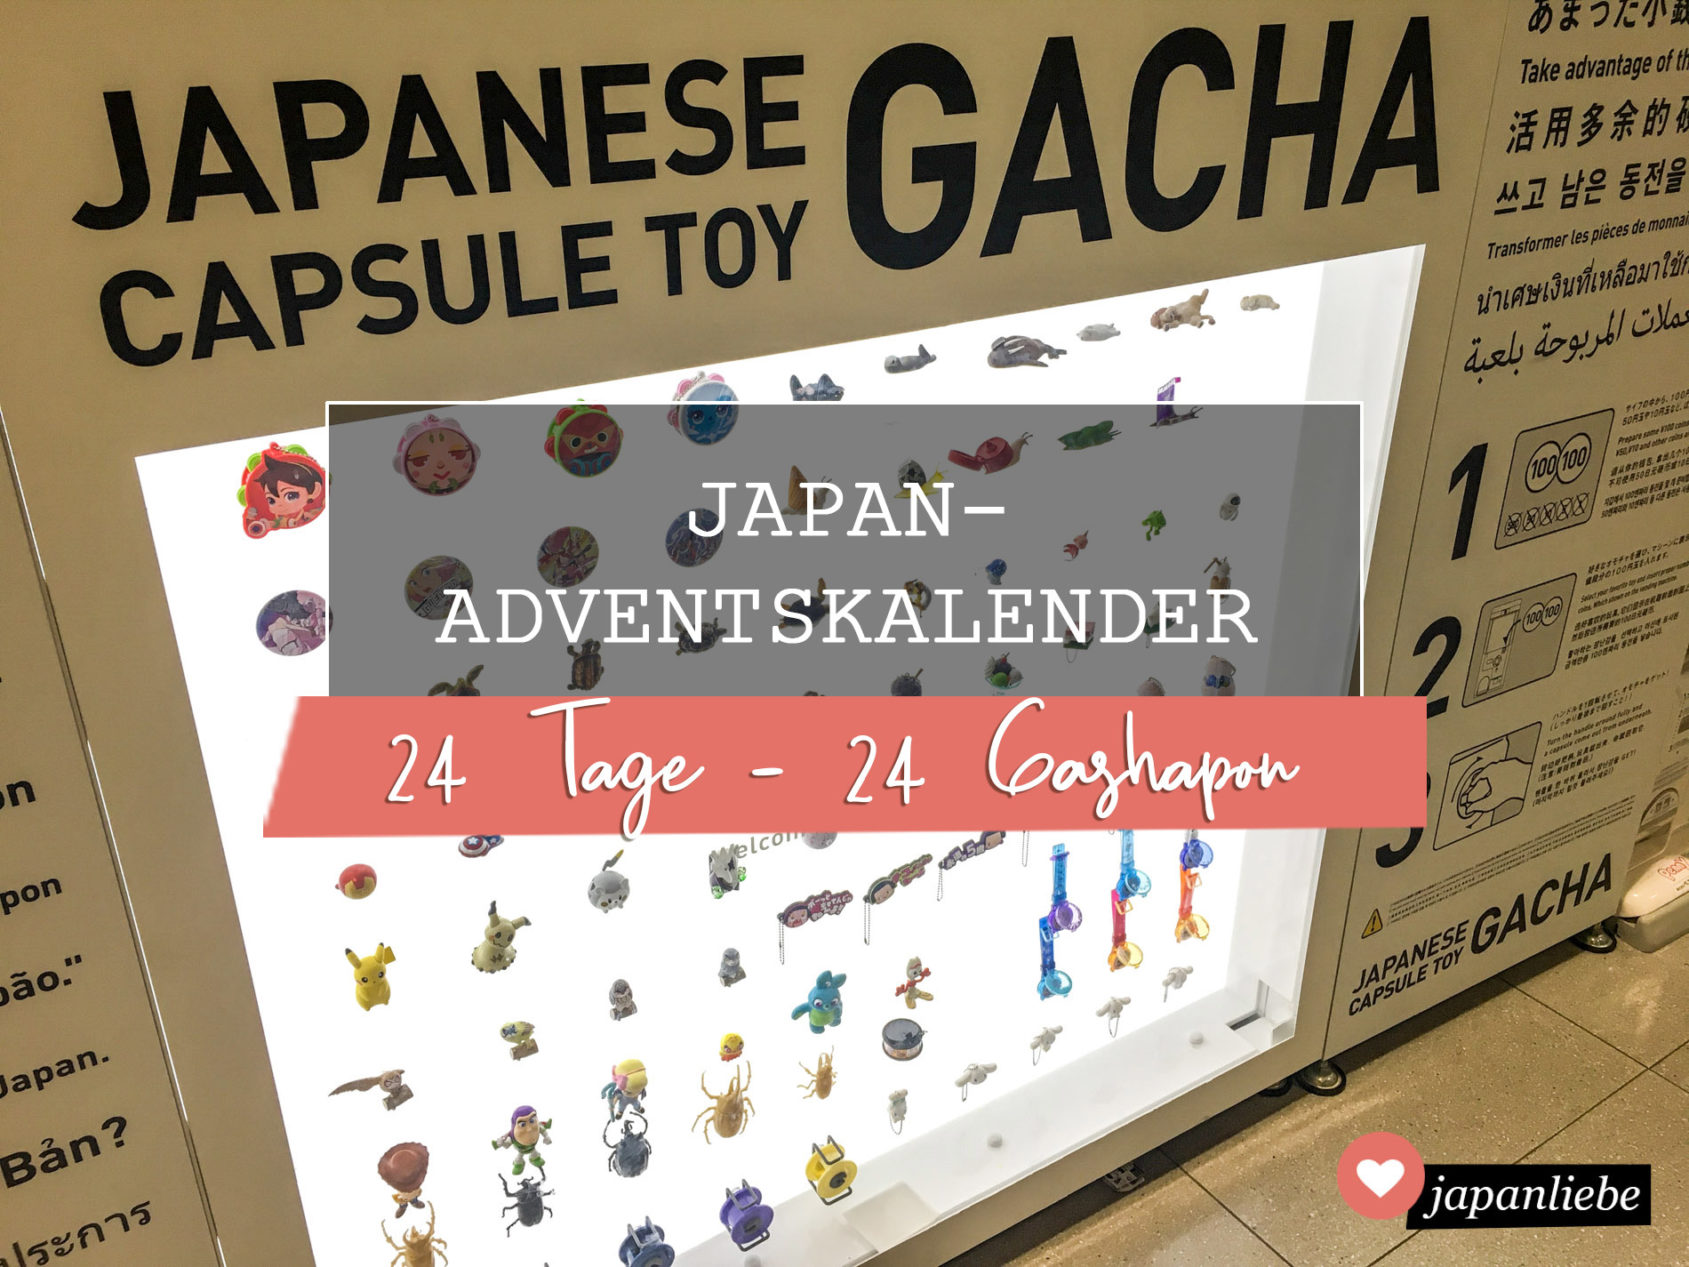 Japan-Adventskalender 2019: 24 Tage – 24 Gashapon